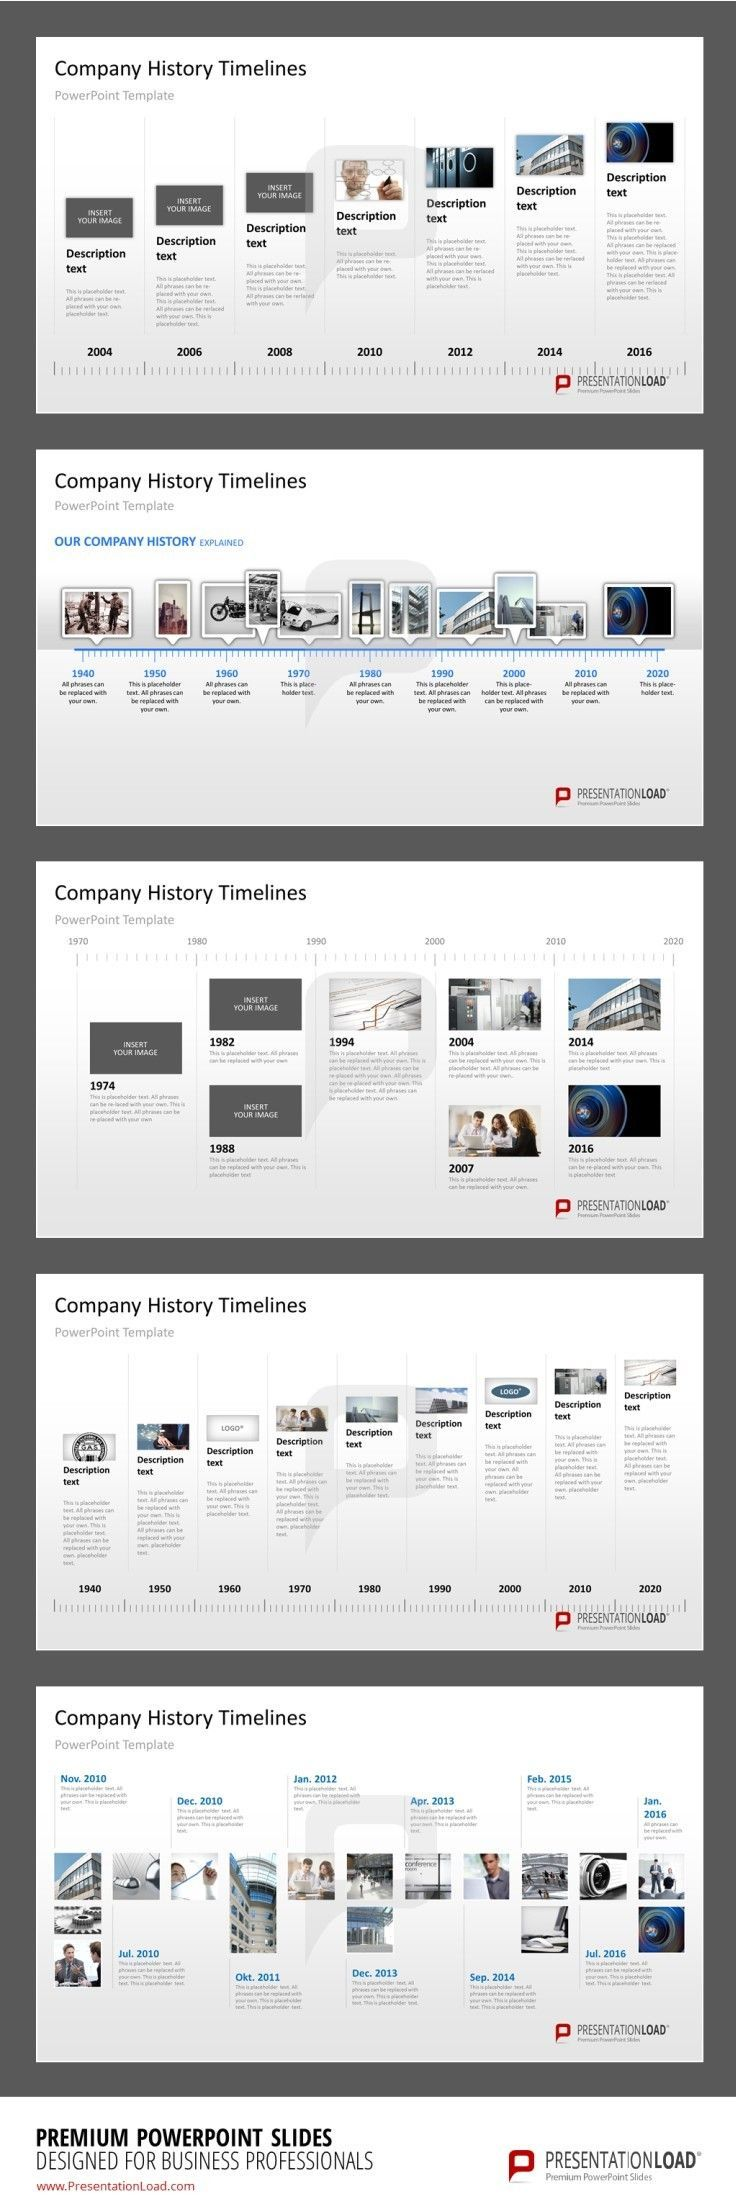 Company history milestones in a timeline powerpoint template company history milestones in a timeline powerpoint template presentationload presentationl toneelgroepblik Choice Image